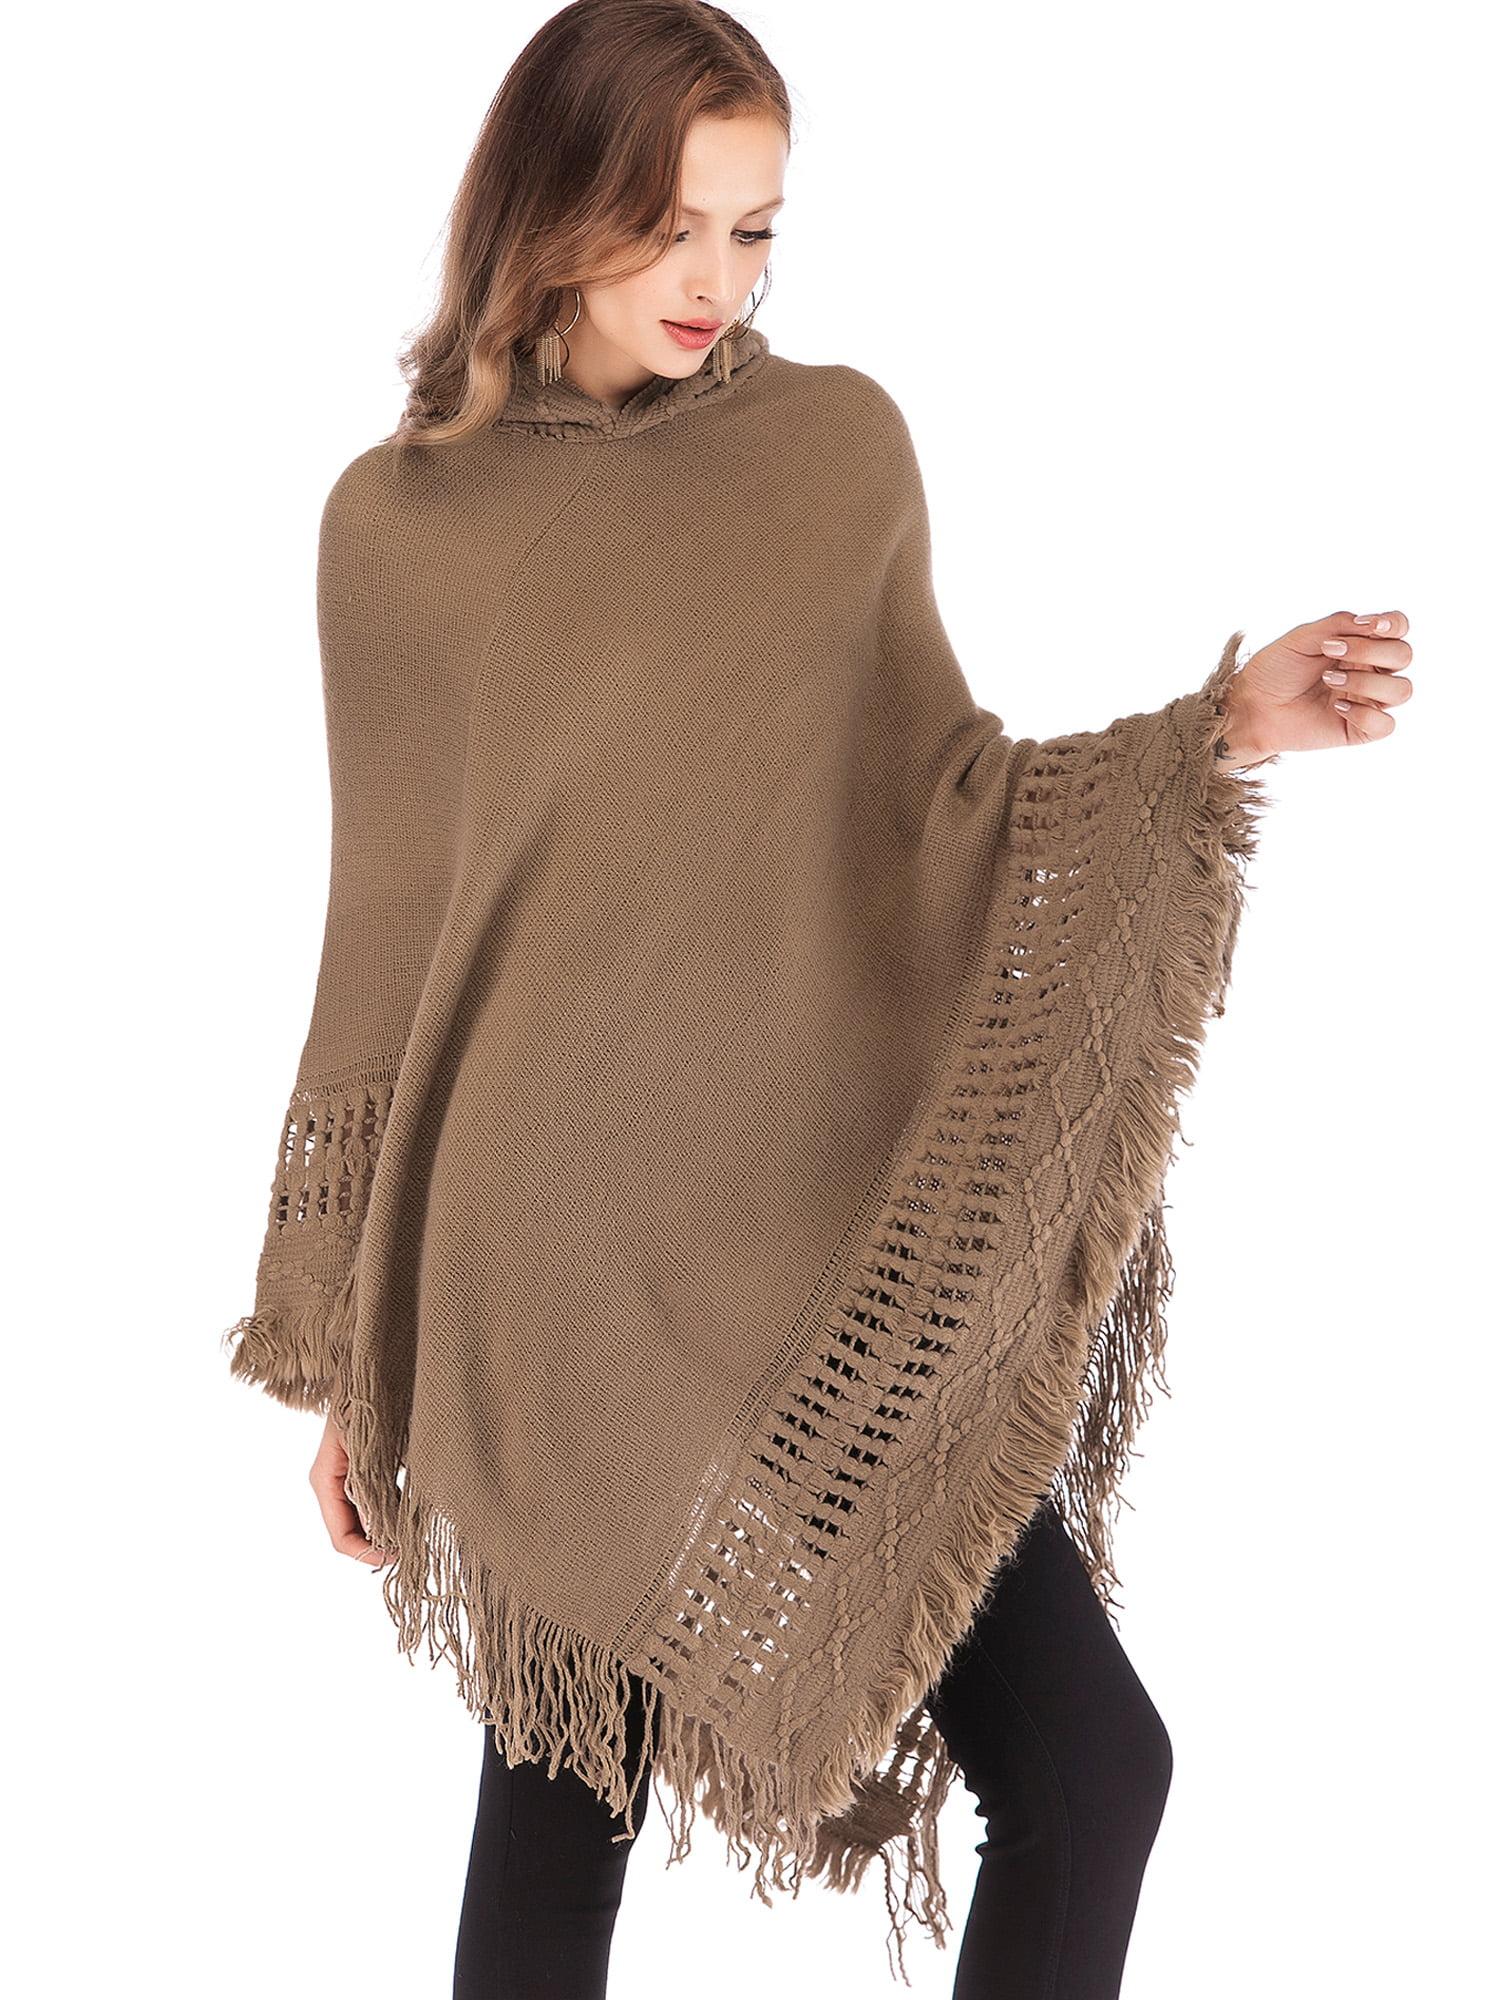 Women Ladies Tassel Fringe Cardigan Shawl Poncho Jumper Sweater Coat  Outwear